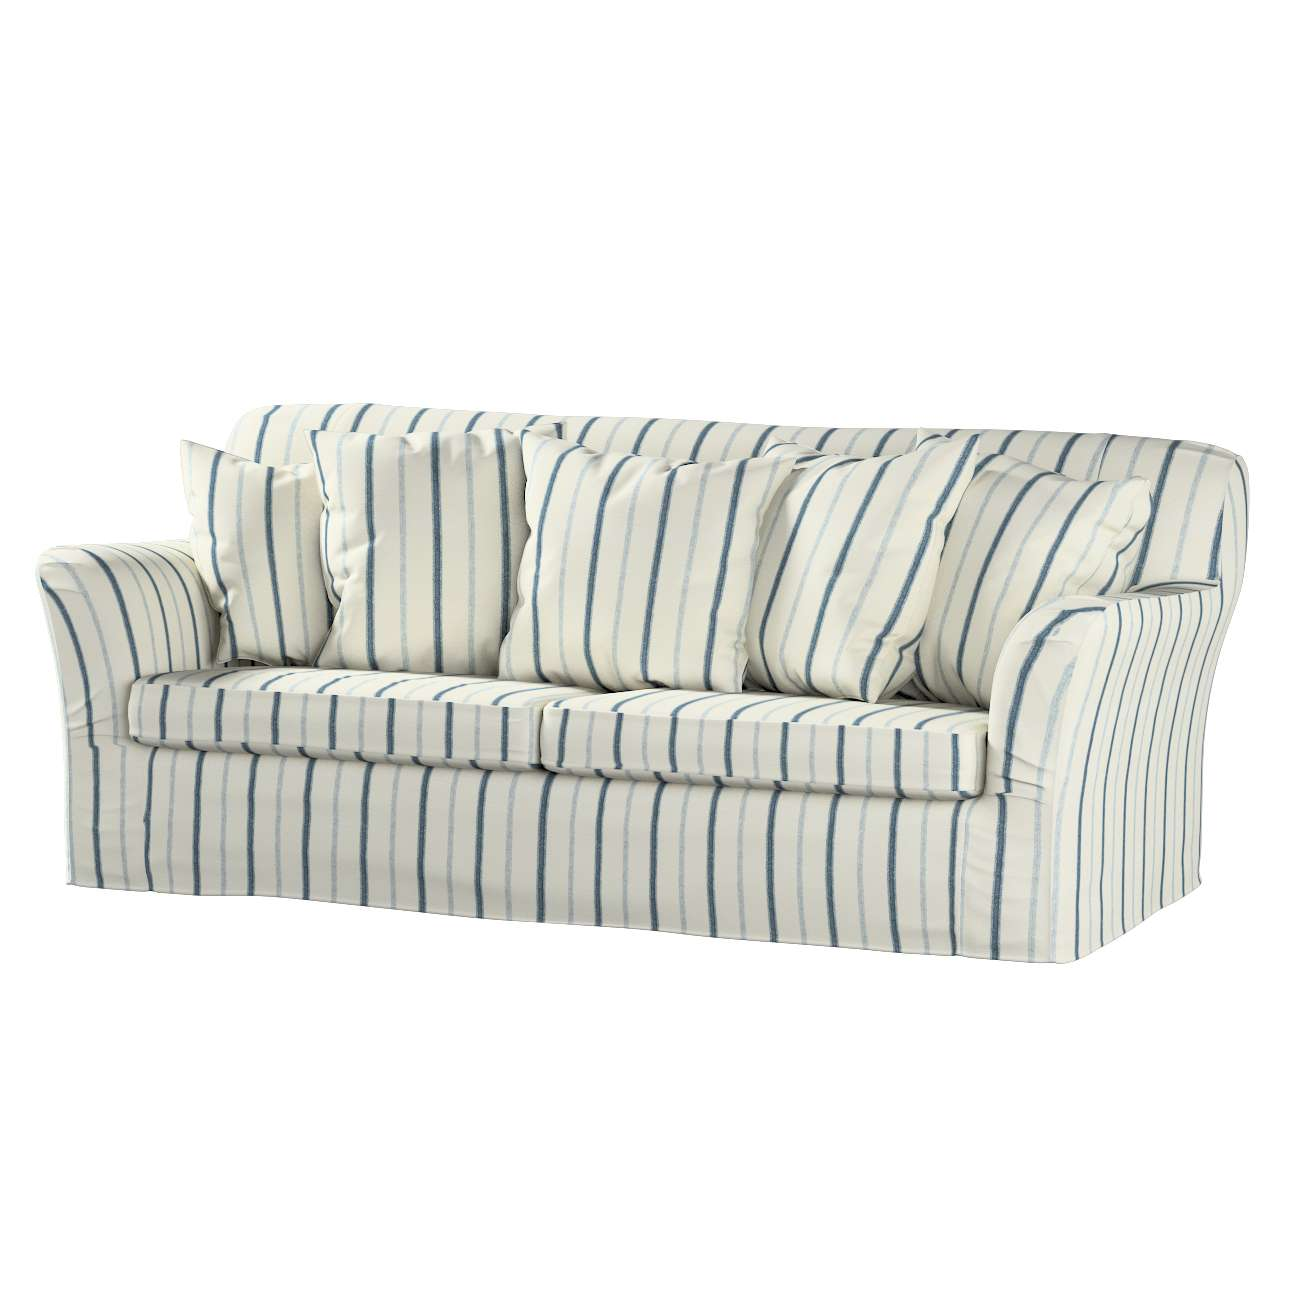 tomelilla schlafsofabezug normale gr e creme blau dekoria. Black Bedroom Furniture Sets. Home Design Ideas